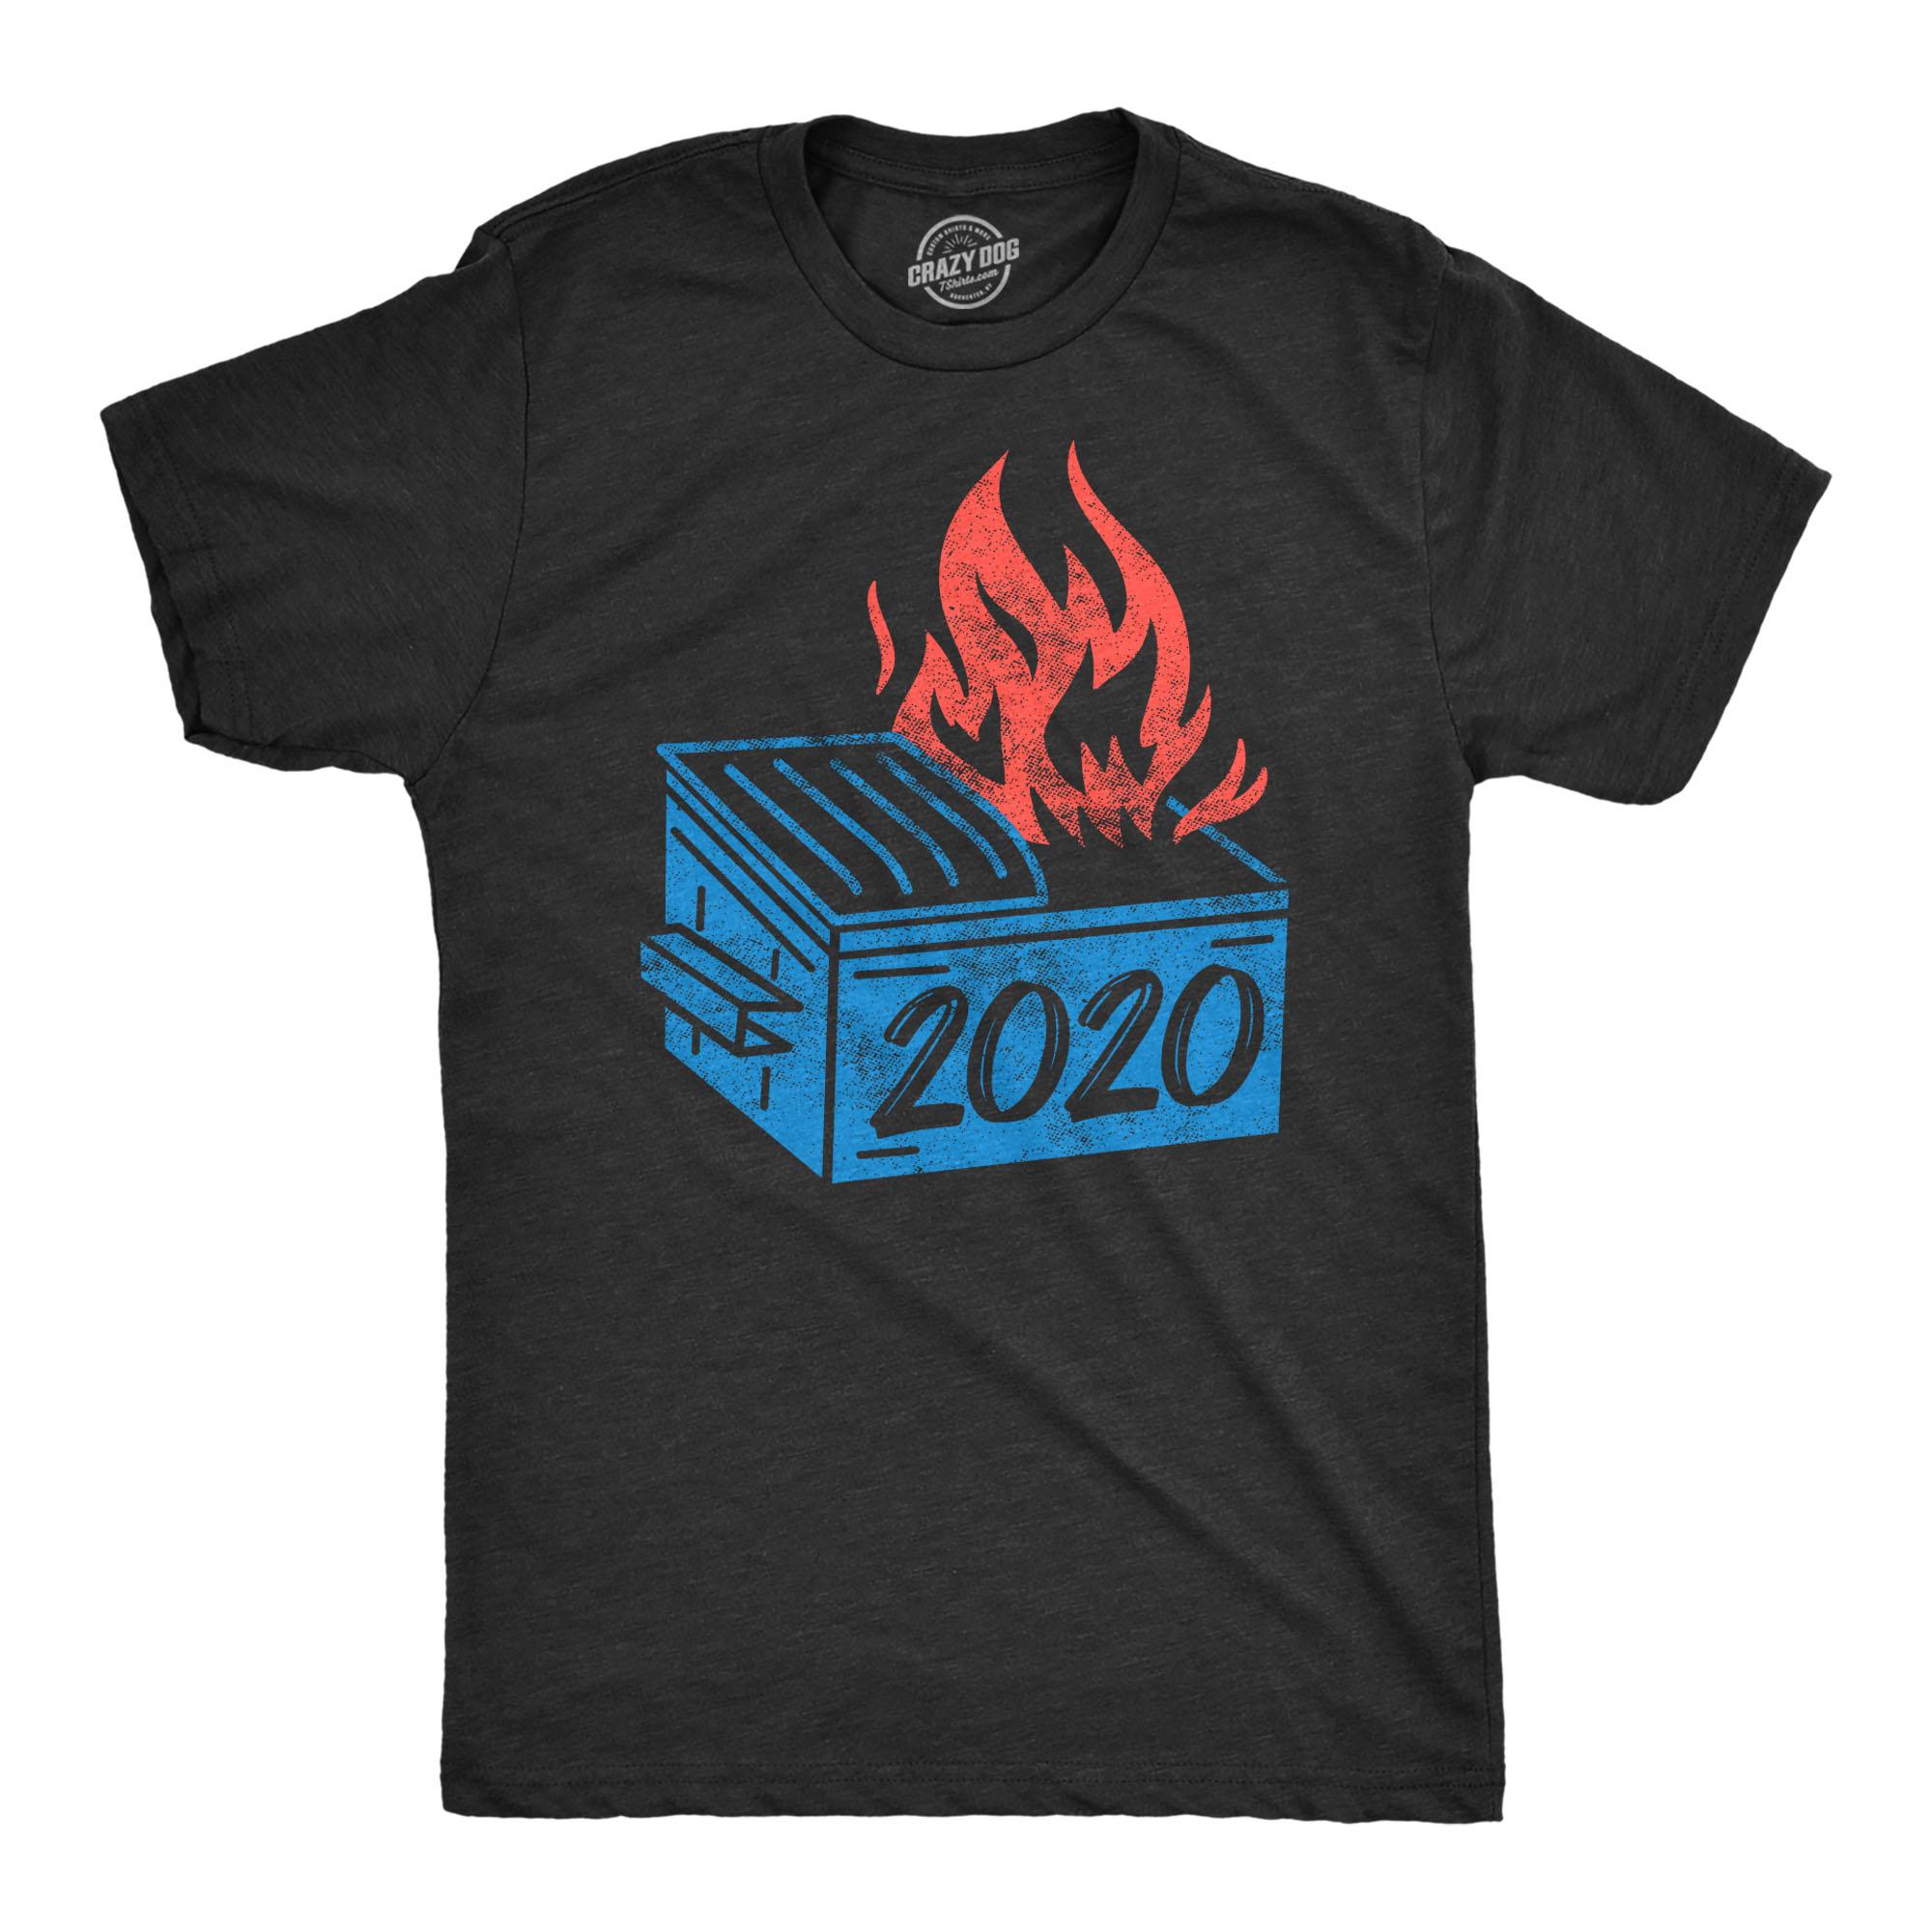 Mens Dumpster Fire 2020 Tshirt Funny Meme Viral Quarantine ...